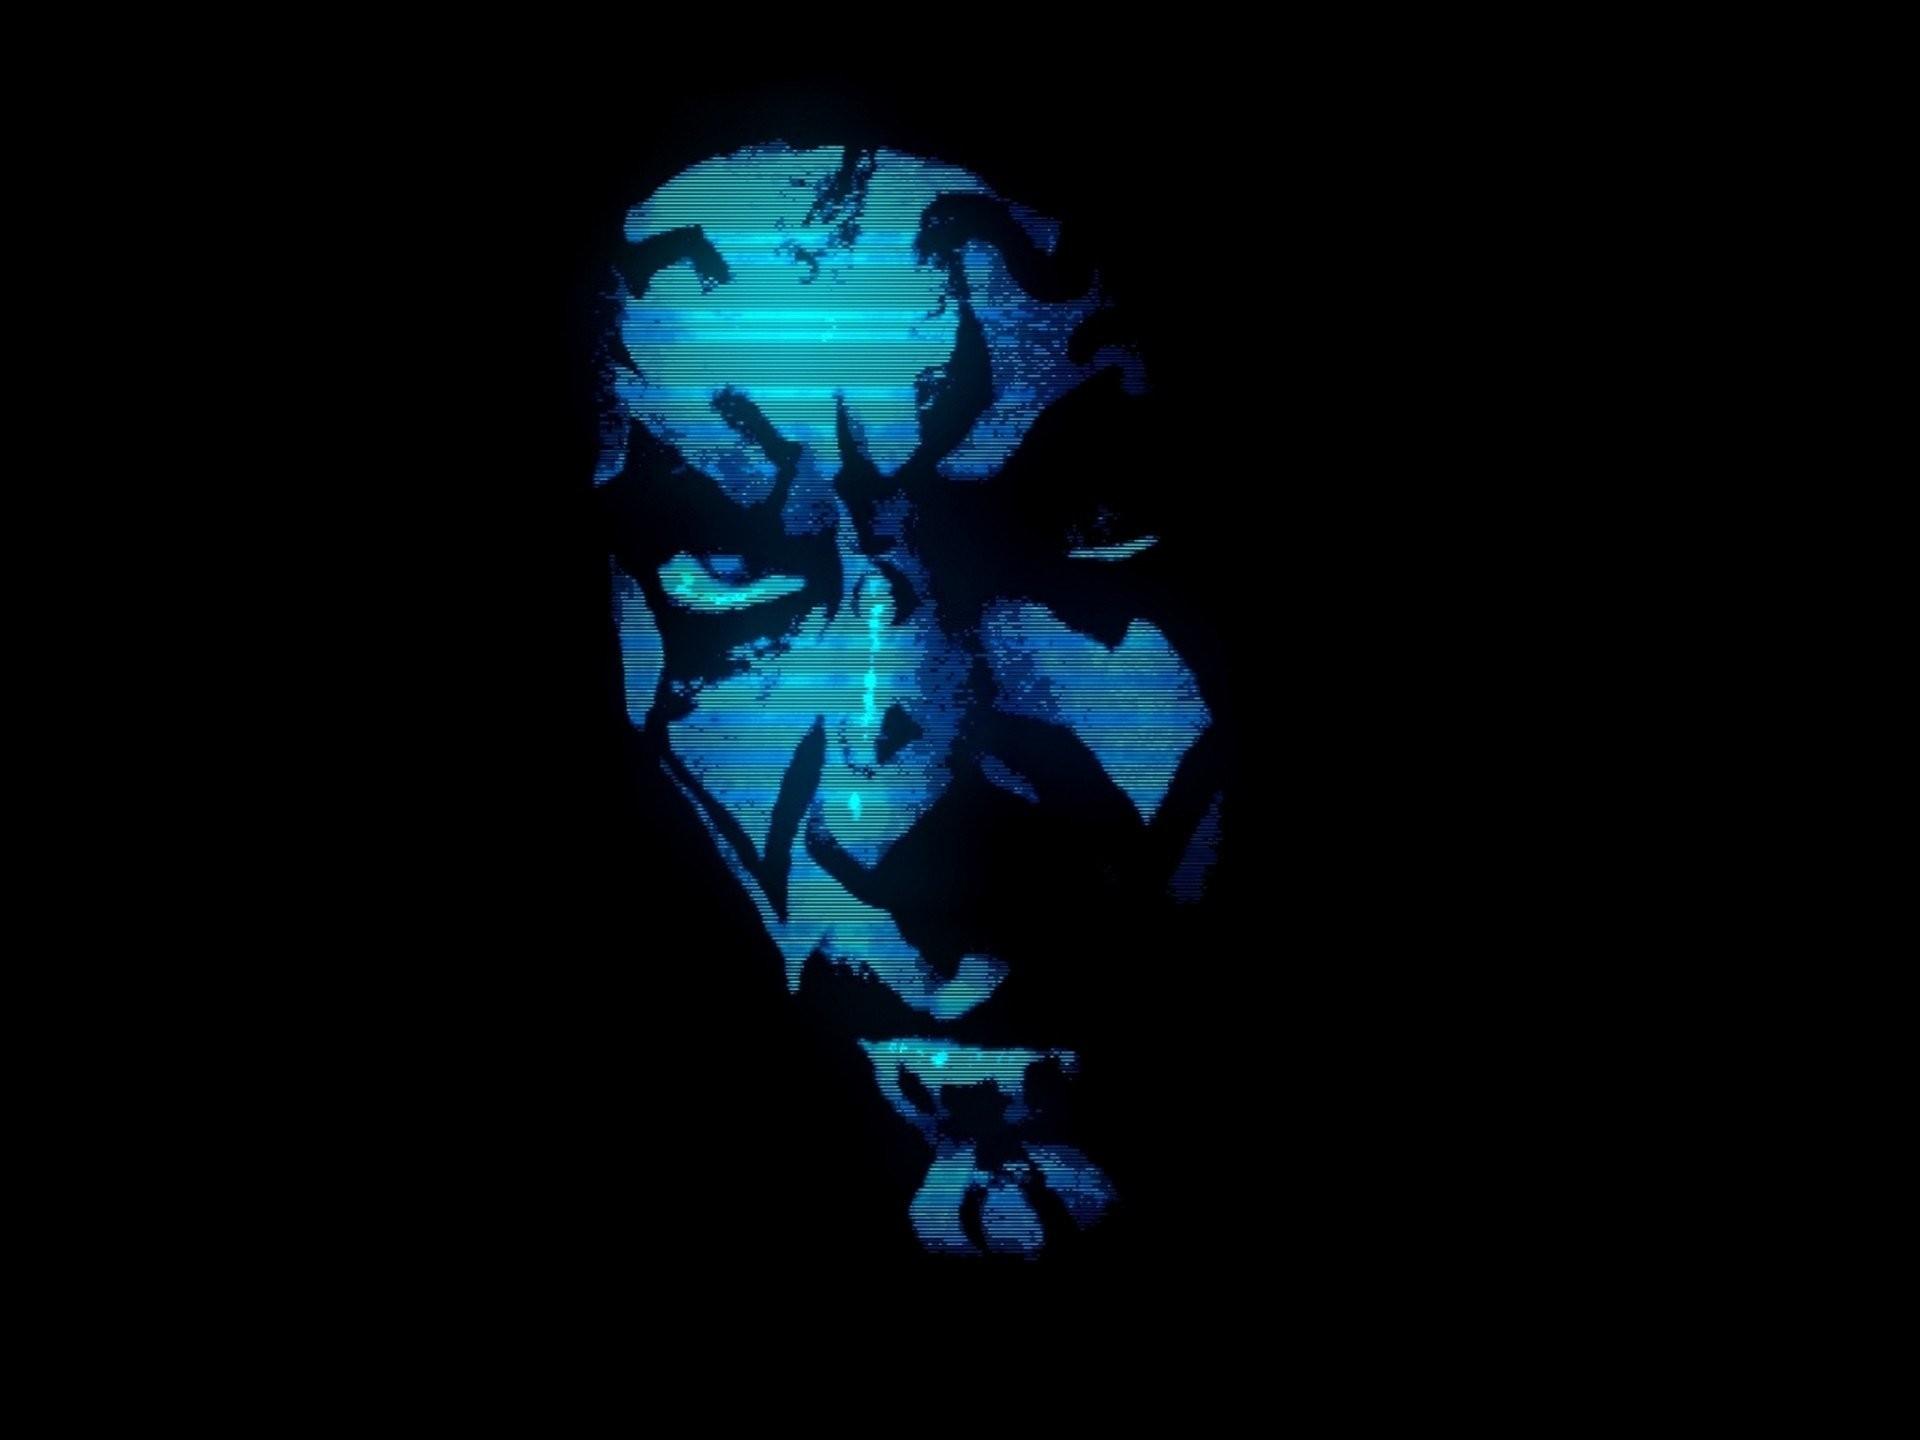 Movie – Star Wars Darth Maul Wallpaper